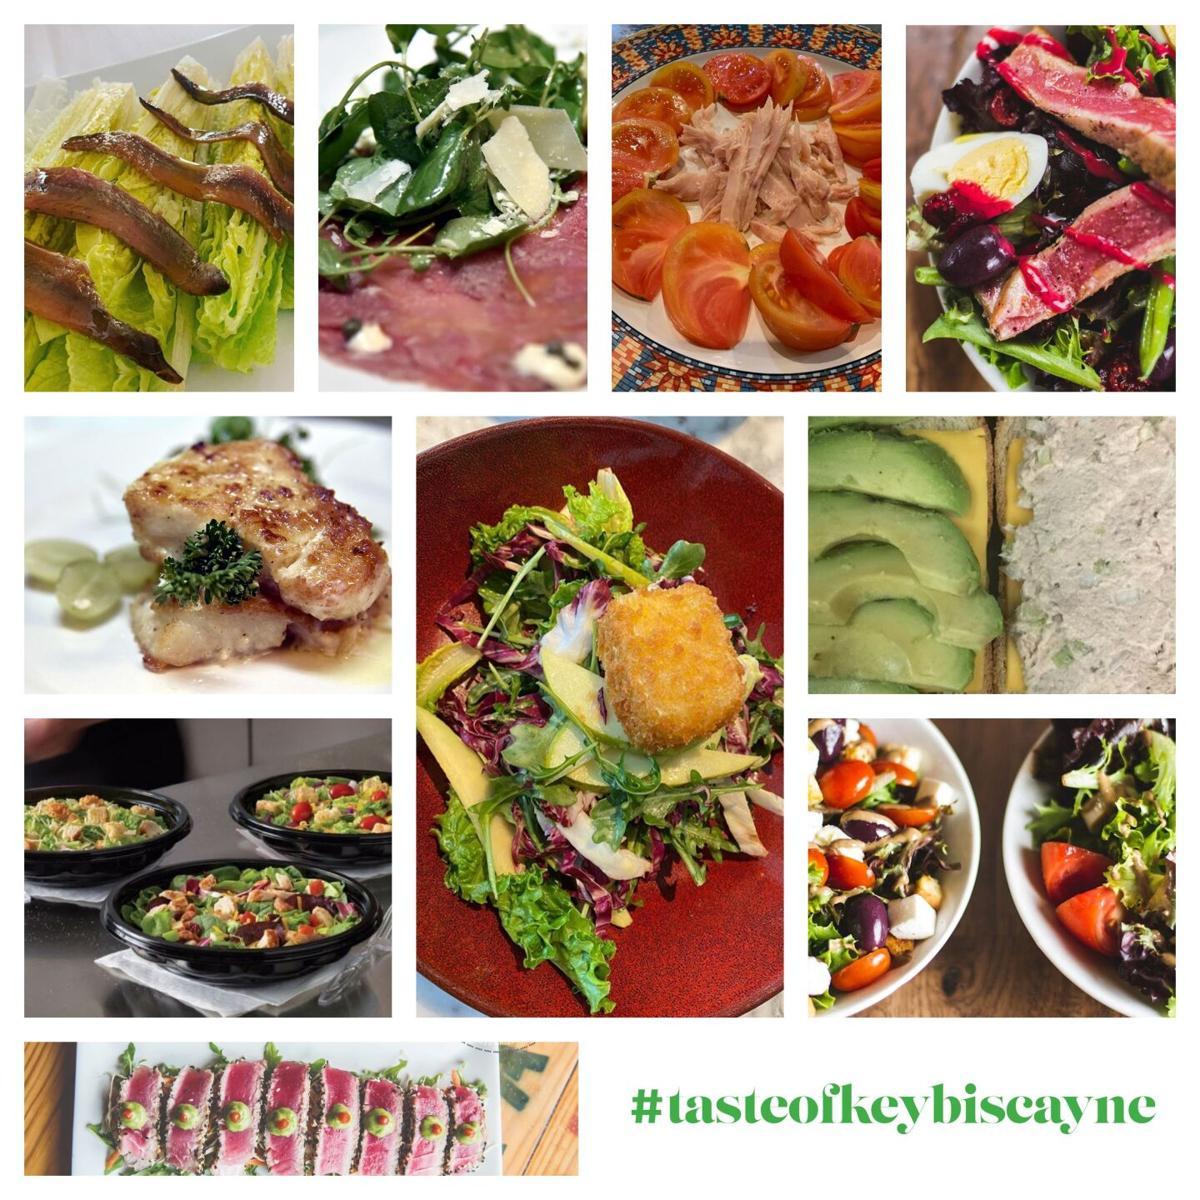 #tasteofkeybiscayne lighter Monday menu (1).jpg